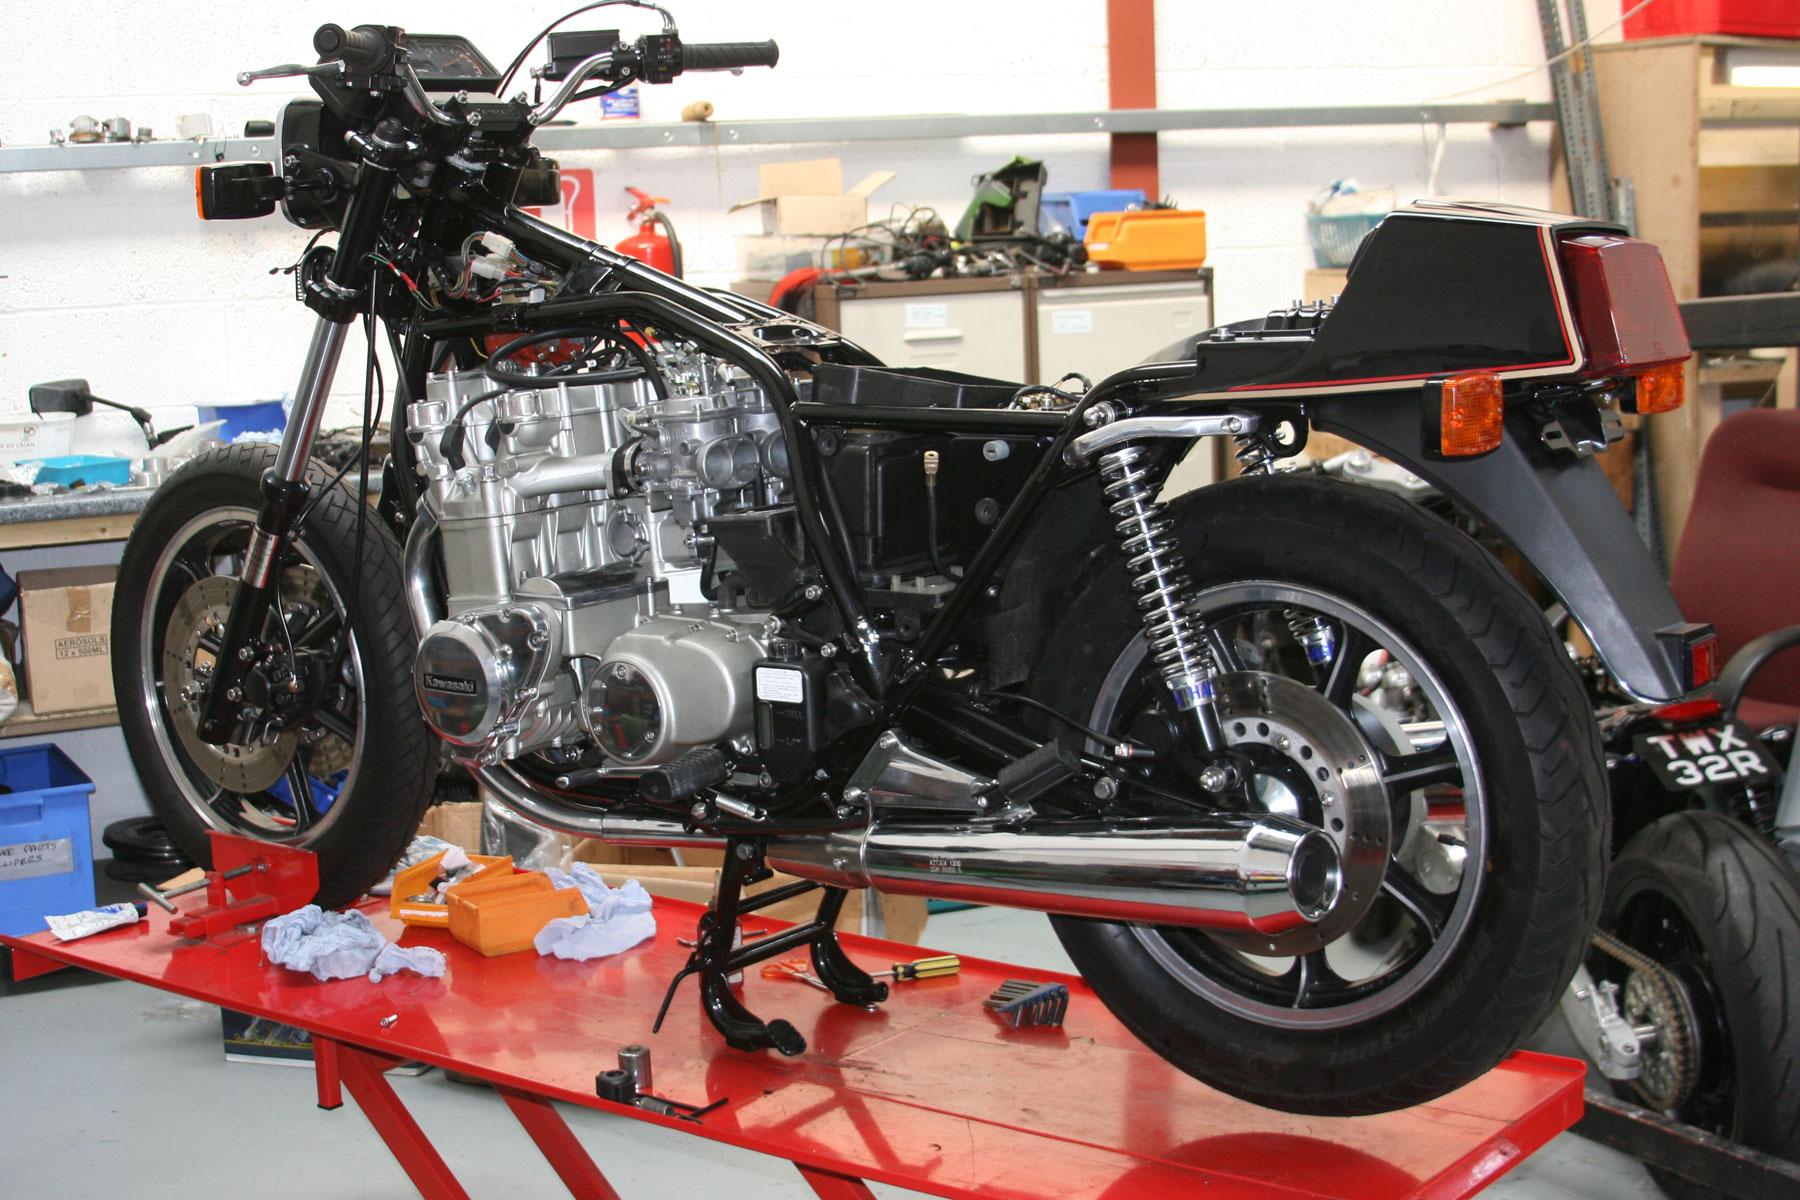 Zed Parts Z1300 Specialist Kawasaki Bromsgrove Ultrasonic Cleaning 1980 Kz1300 Wiring Harness Bike 004